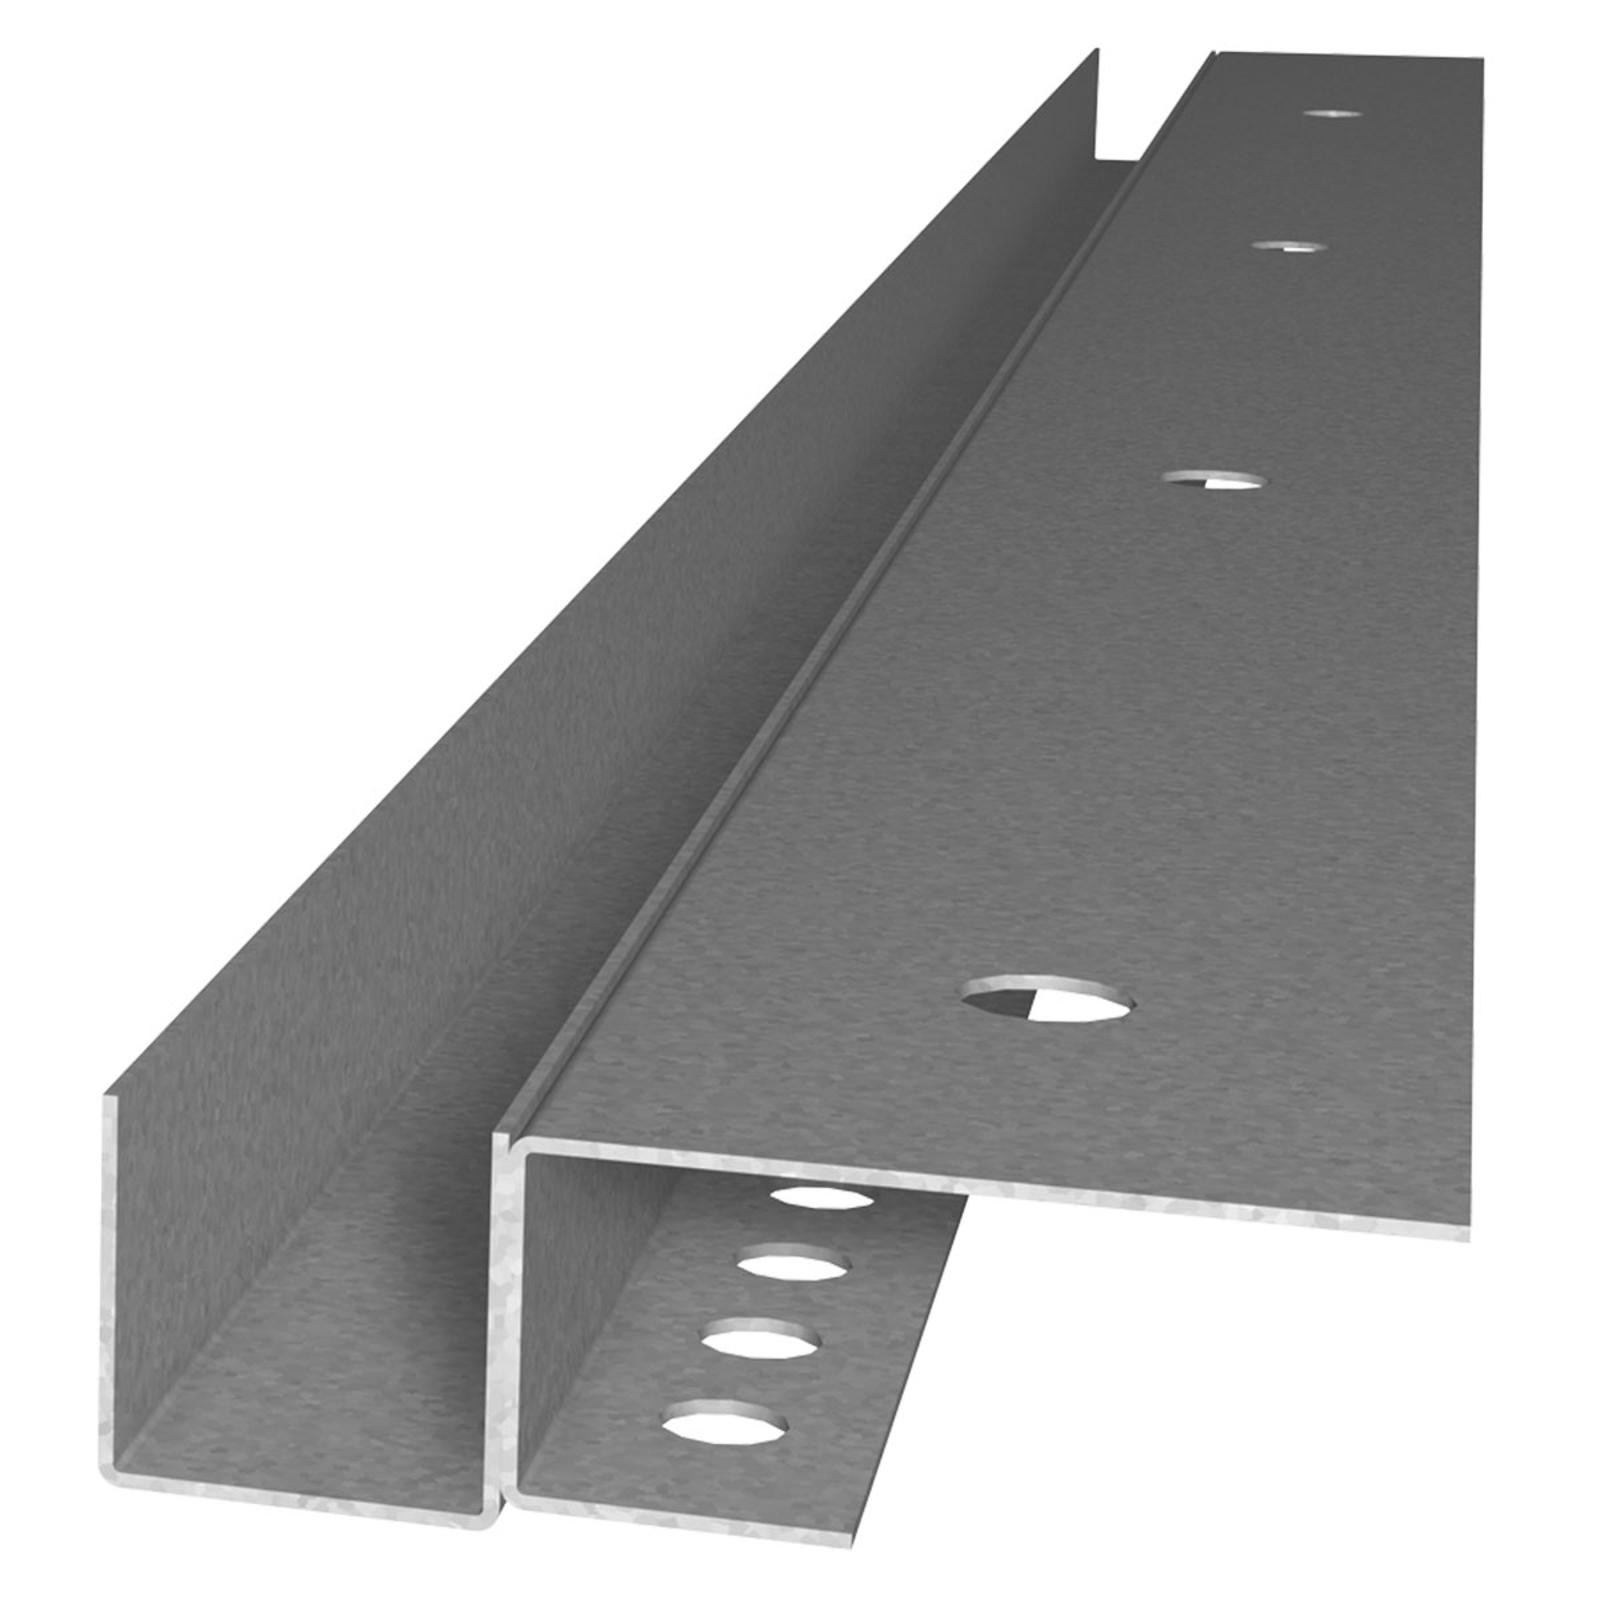 DSL Trockenbauprofil für Unterkonstruktion gerade